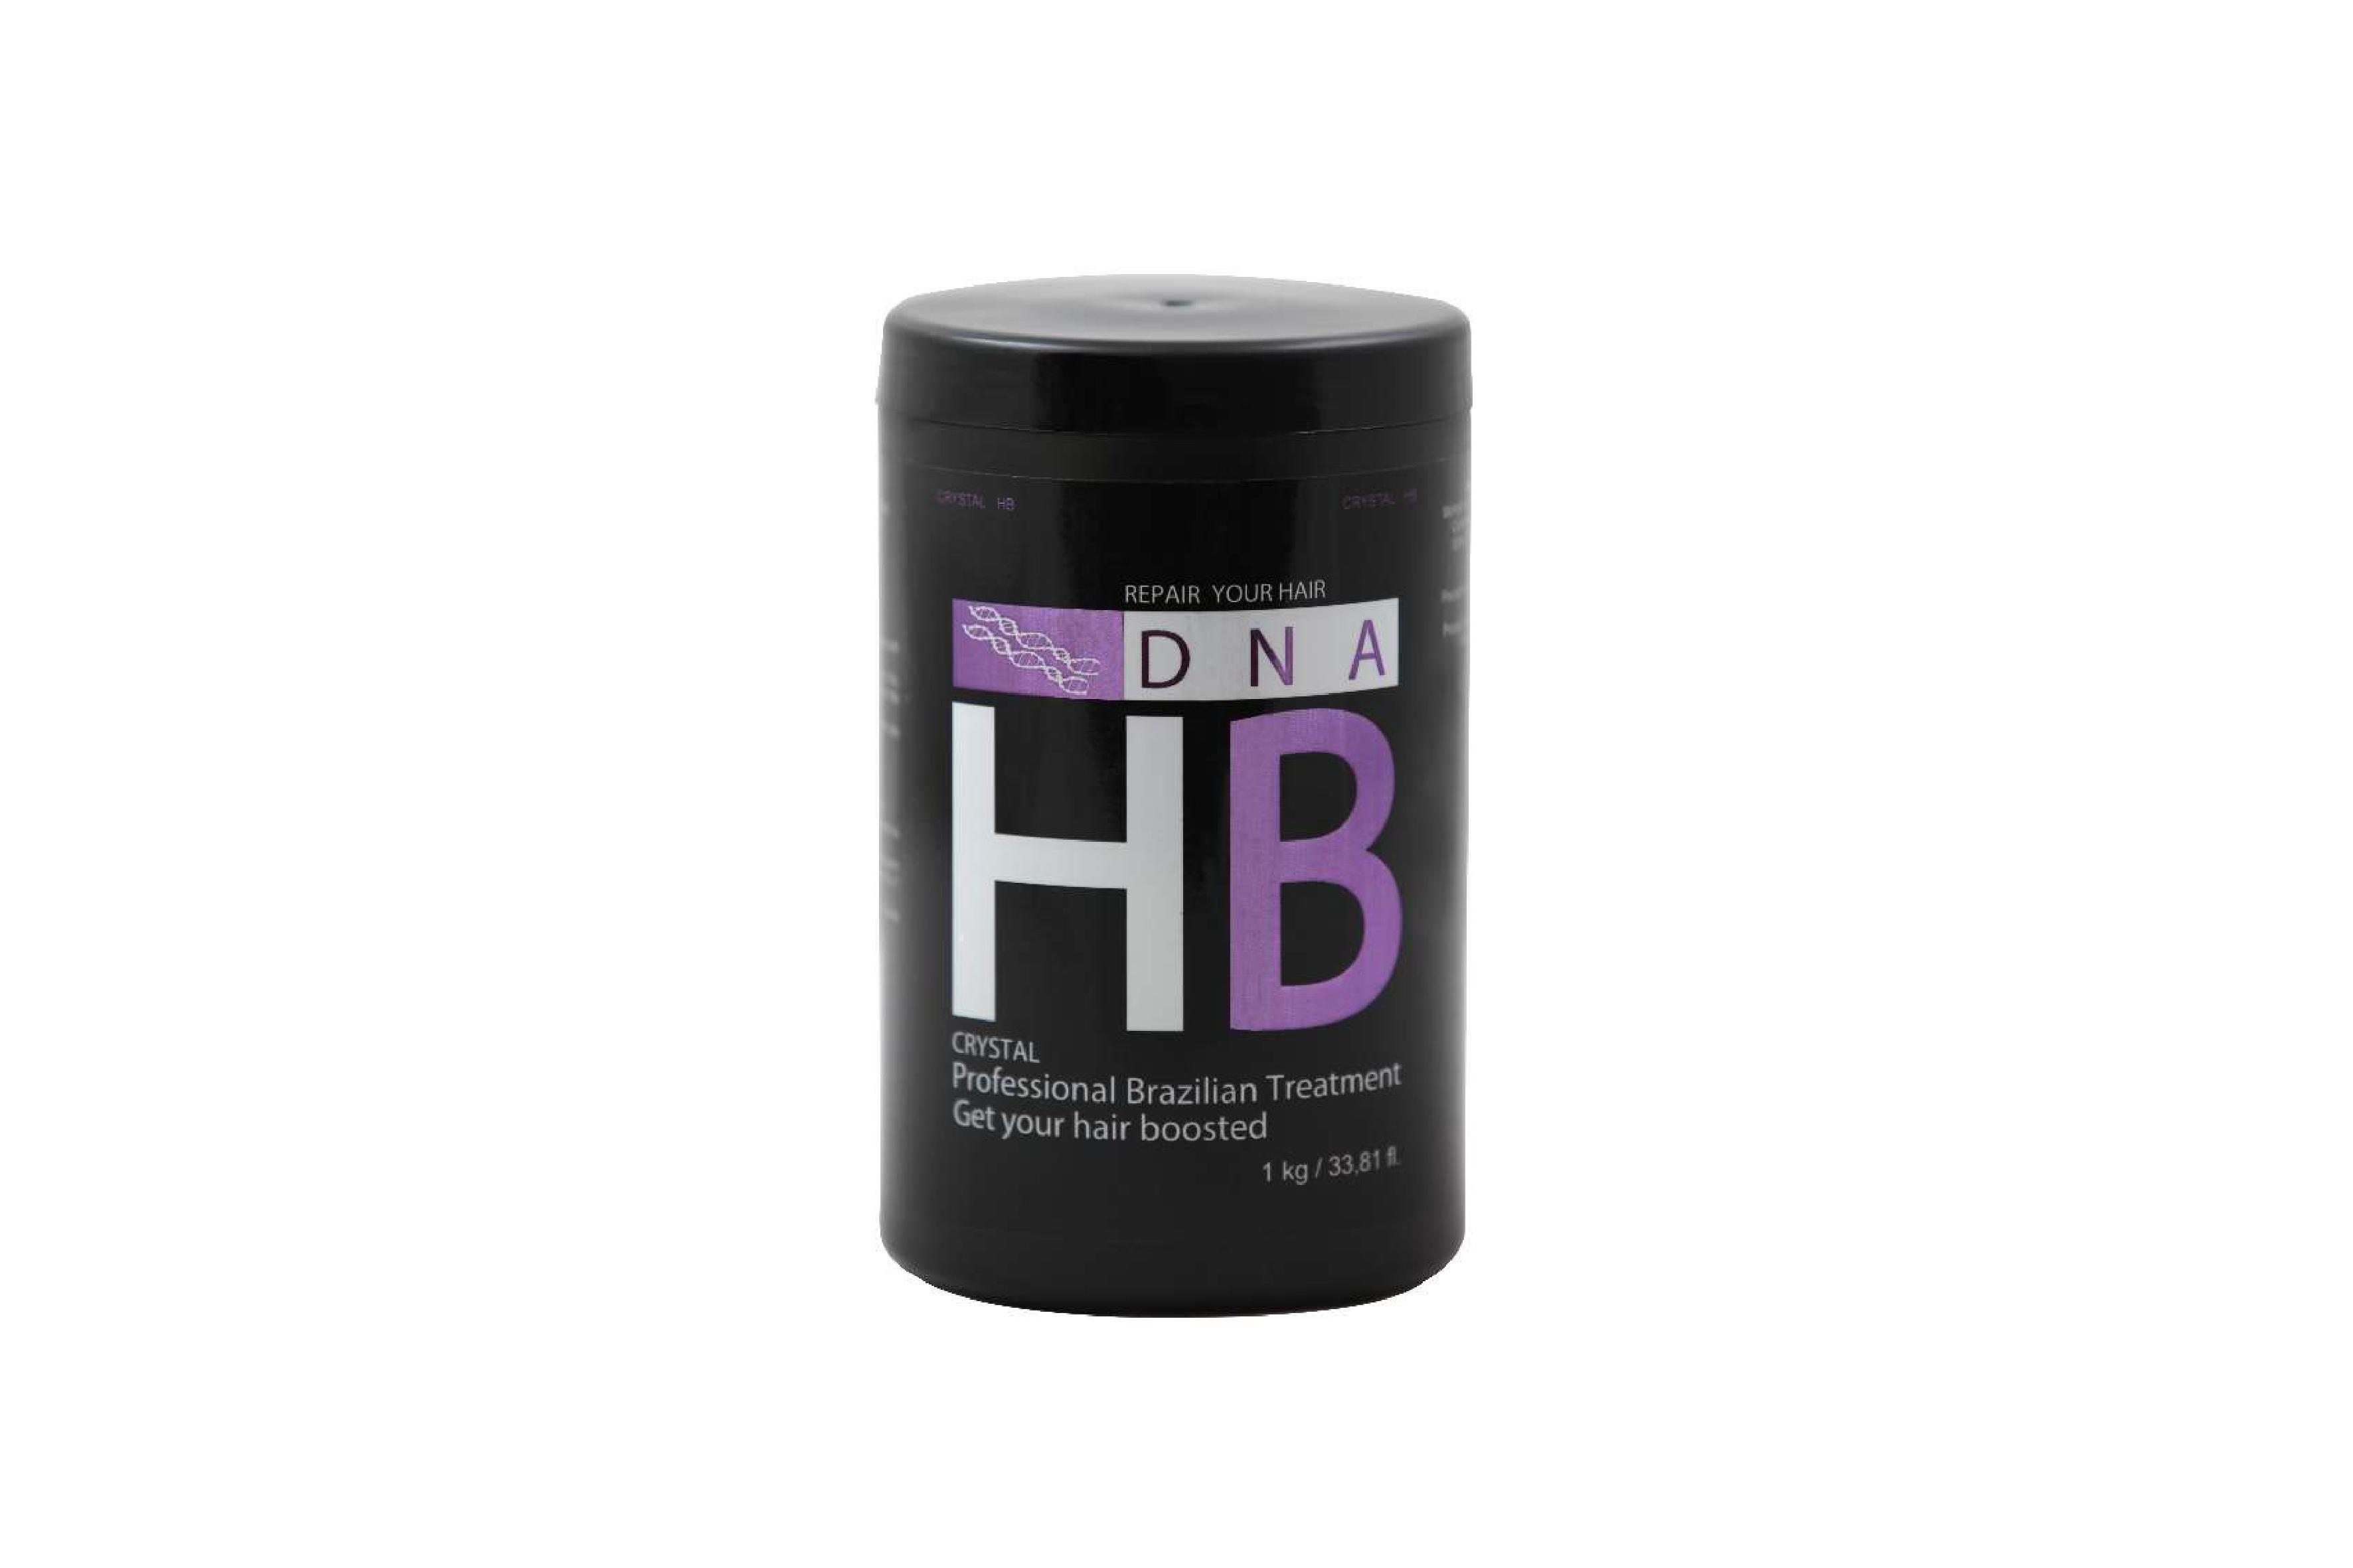 Crystal dna hb professional brazilian treatment